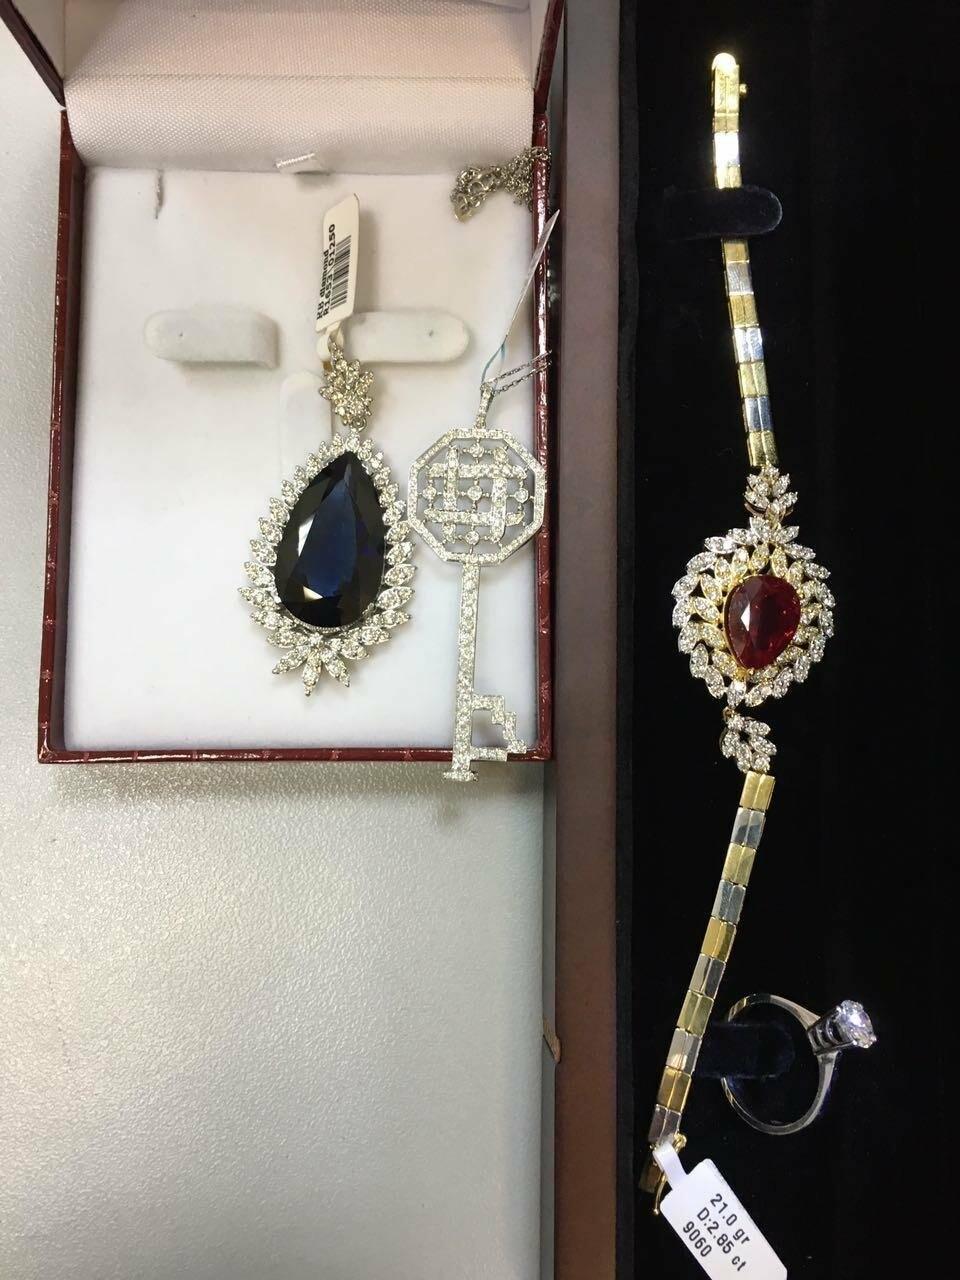 Домодедовские таможенники изъяли украшения с бриллиантами на сумму более 2,5 млн рублей, фото-1